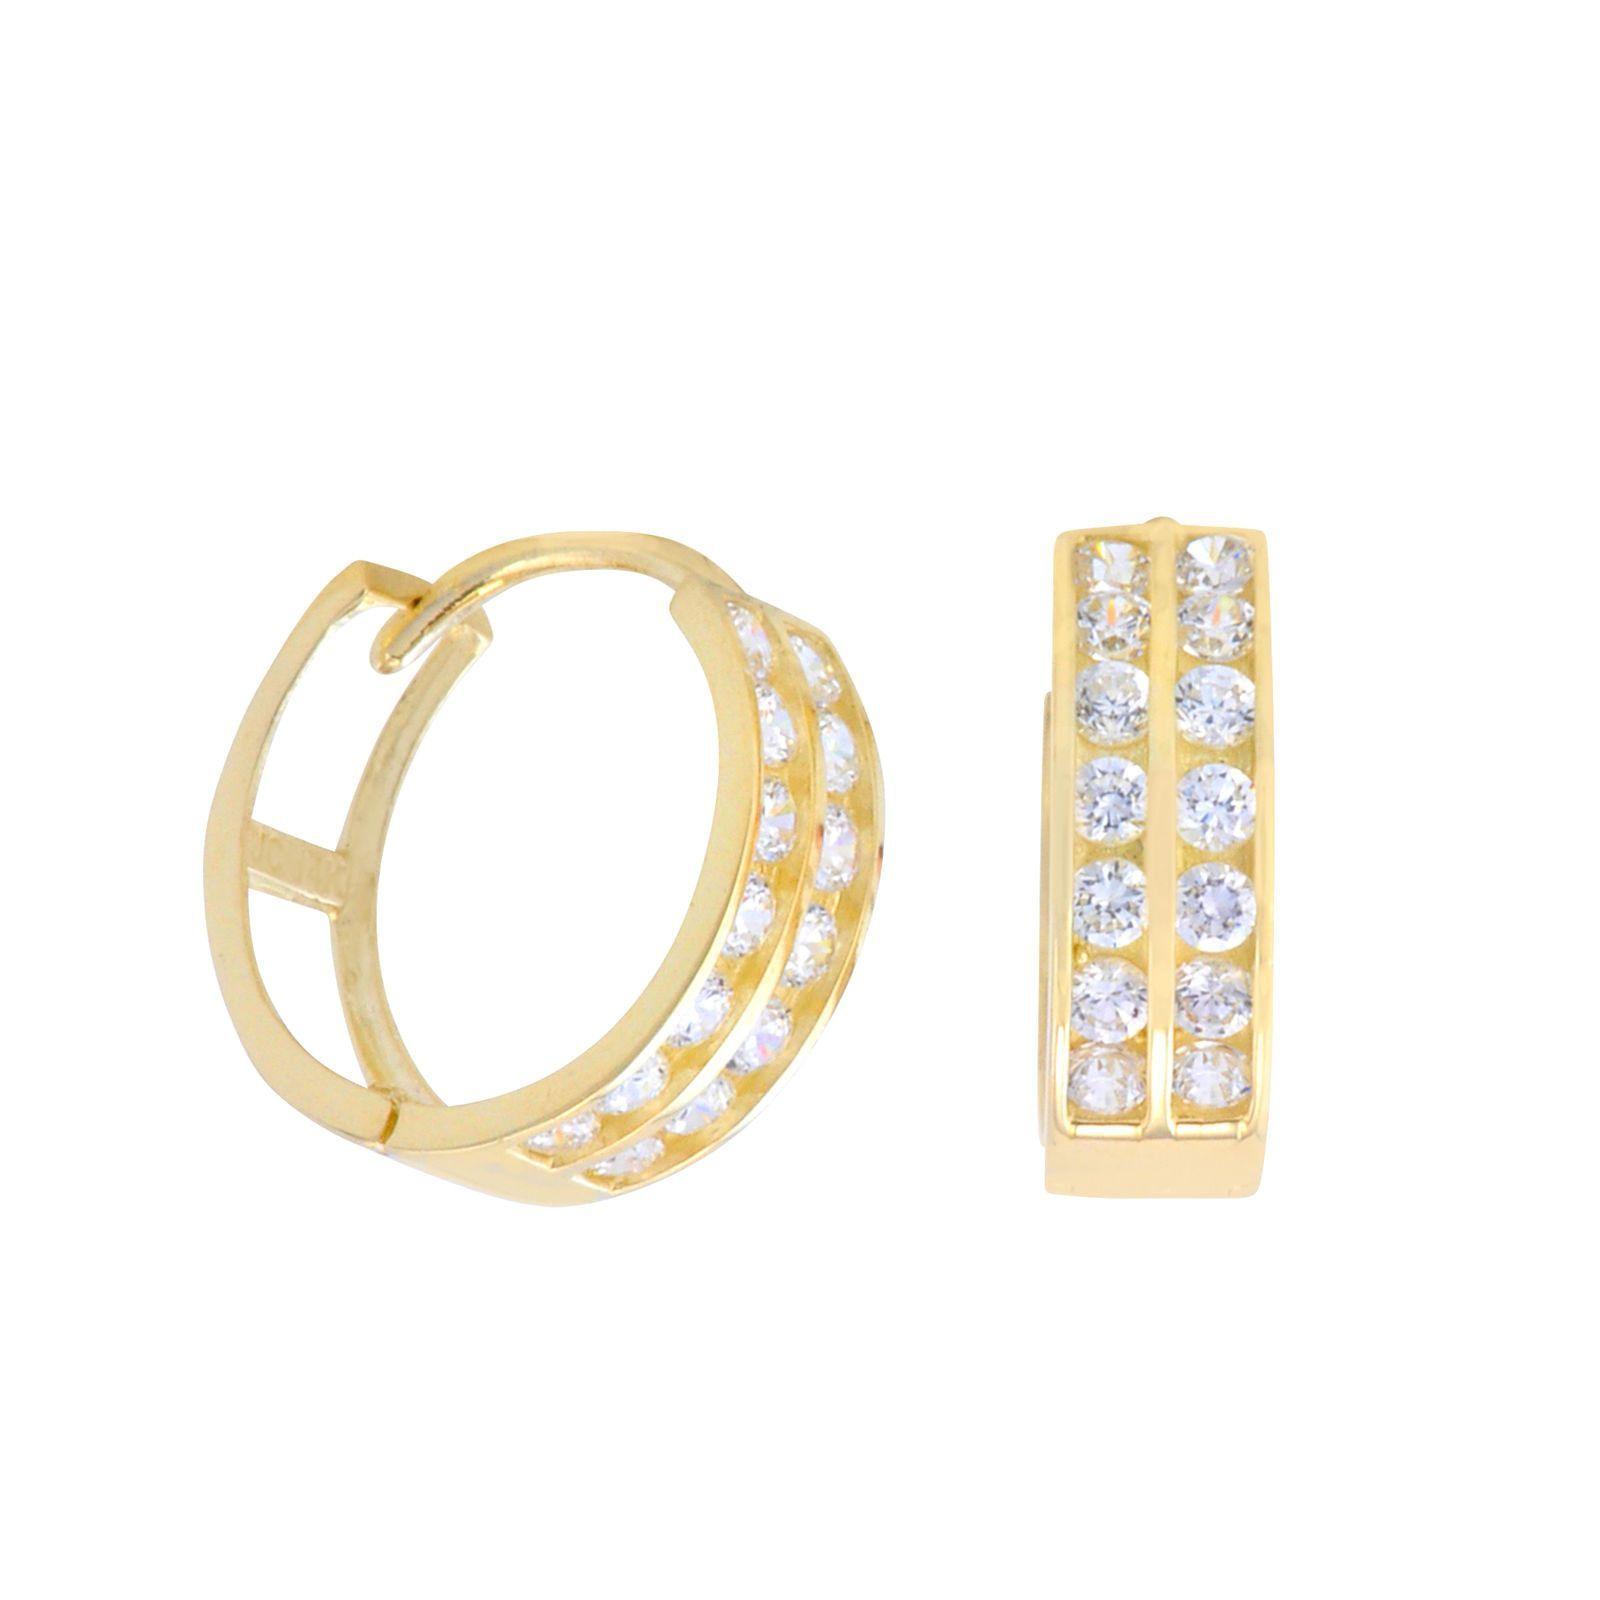 Small Diamond Hoop Earrings Yellow Gold Phenomenal Earrings Pearl